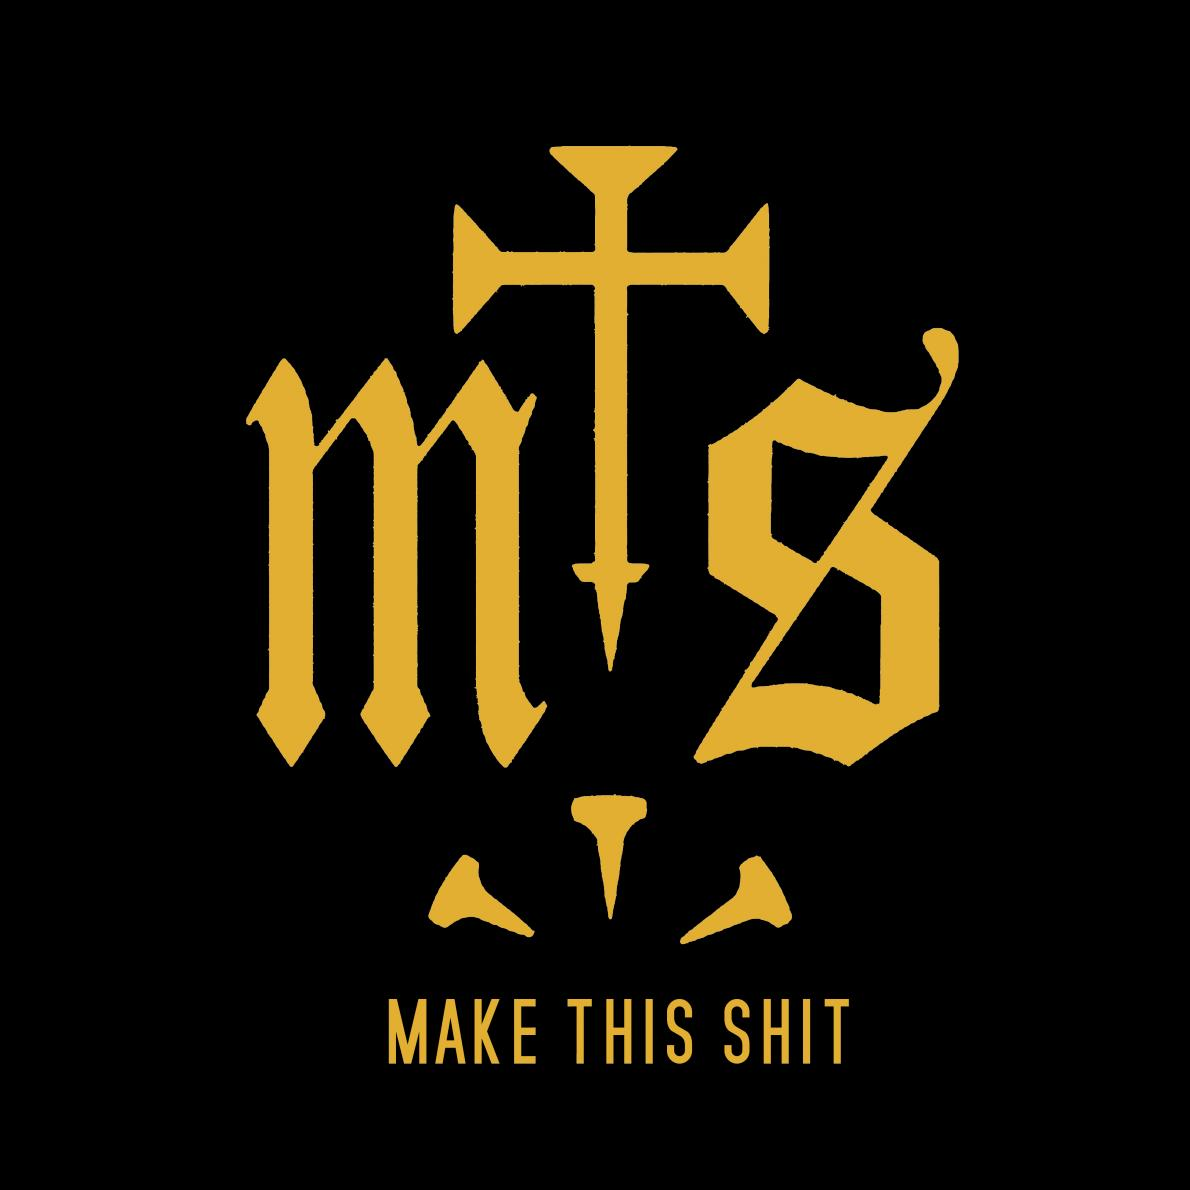 logo mts ufficiale (2)